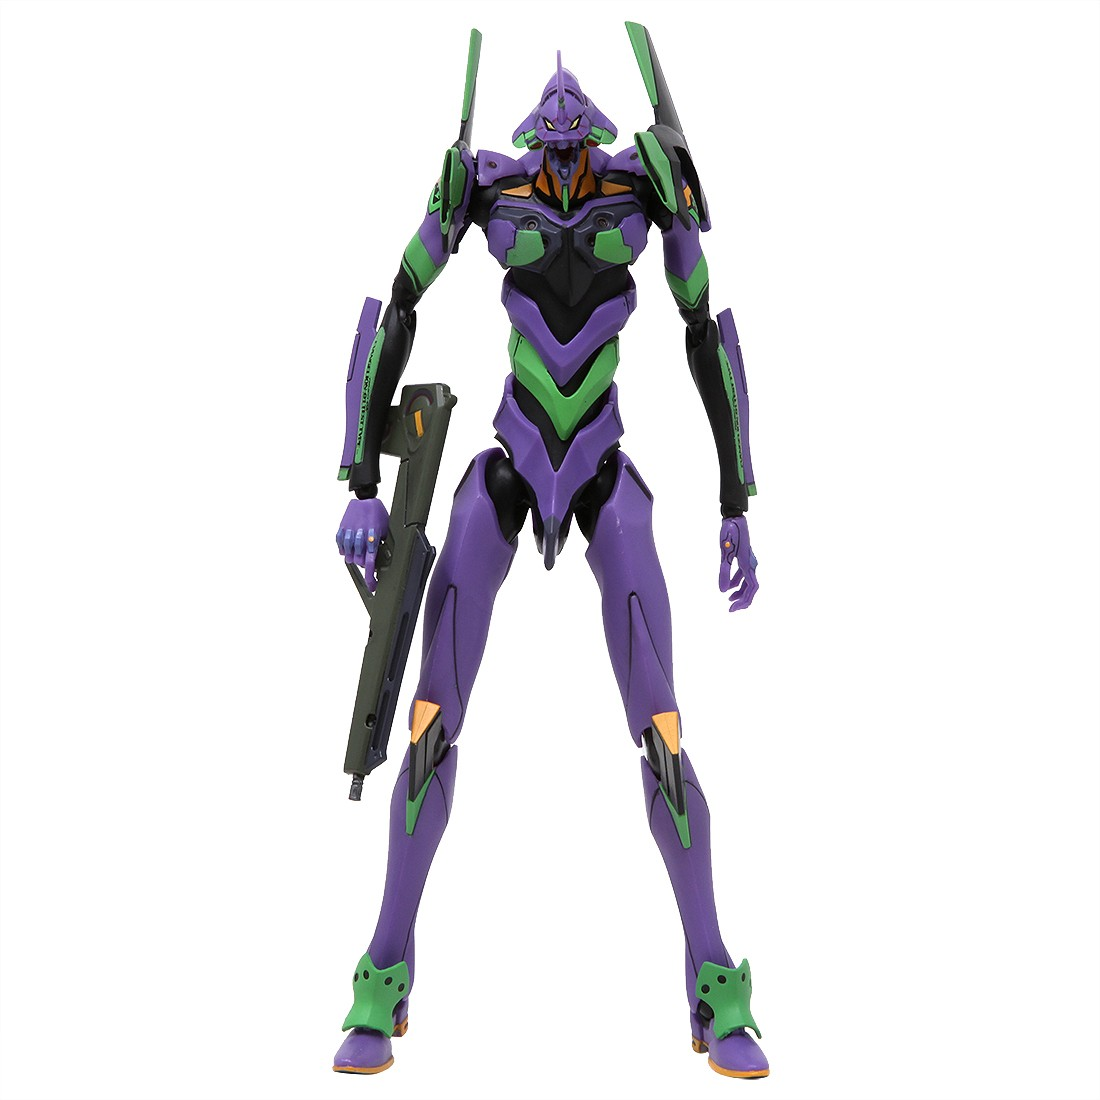 Medicom MAFEX Neon Genesis Evangelion Shogoki Figure (purple)